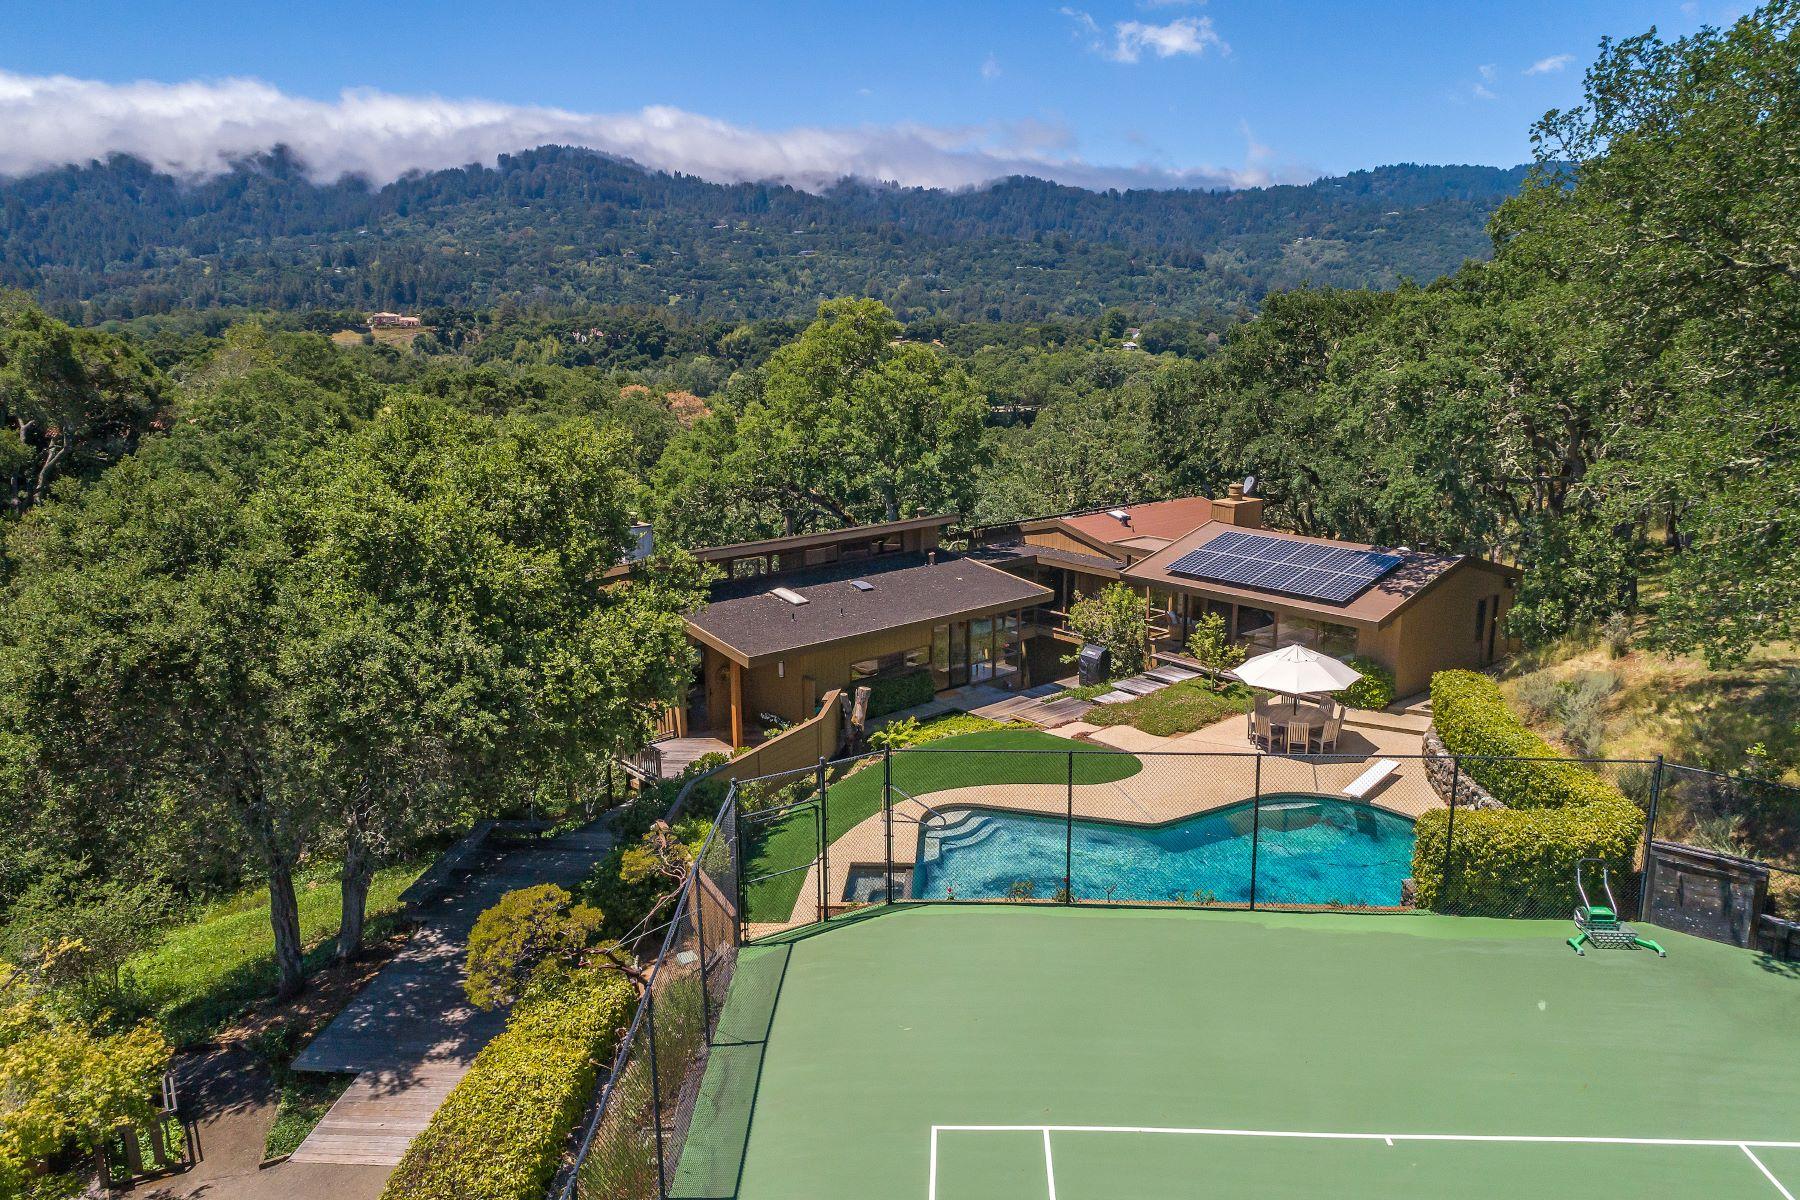 Other Residential Homes 为 销售 在 Captivating Mid-Century Modern 177 Ramoso Road 波托拉谷, 加利福尼亚州 94028 美国